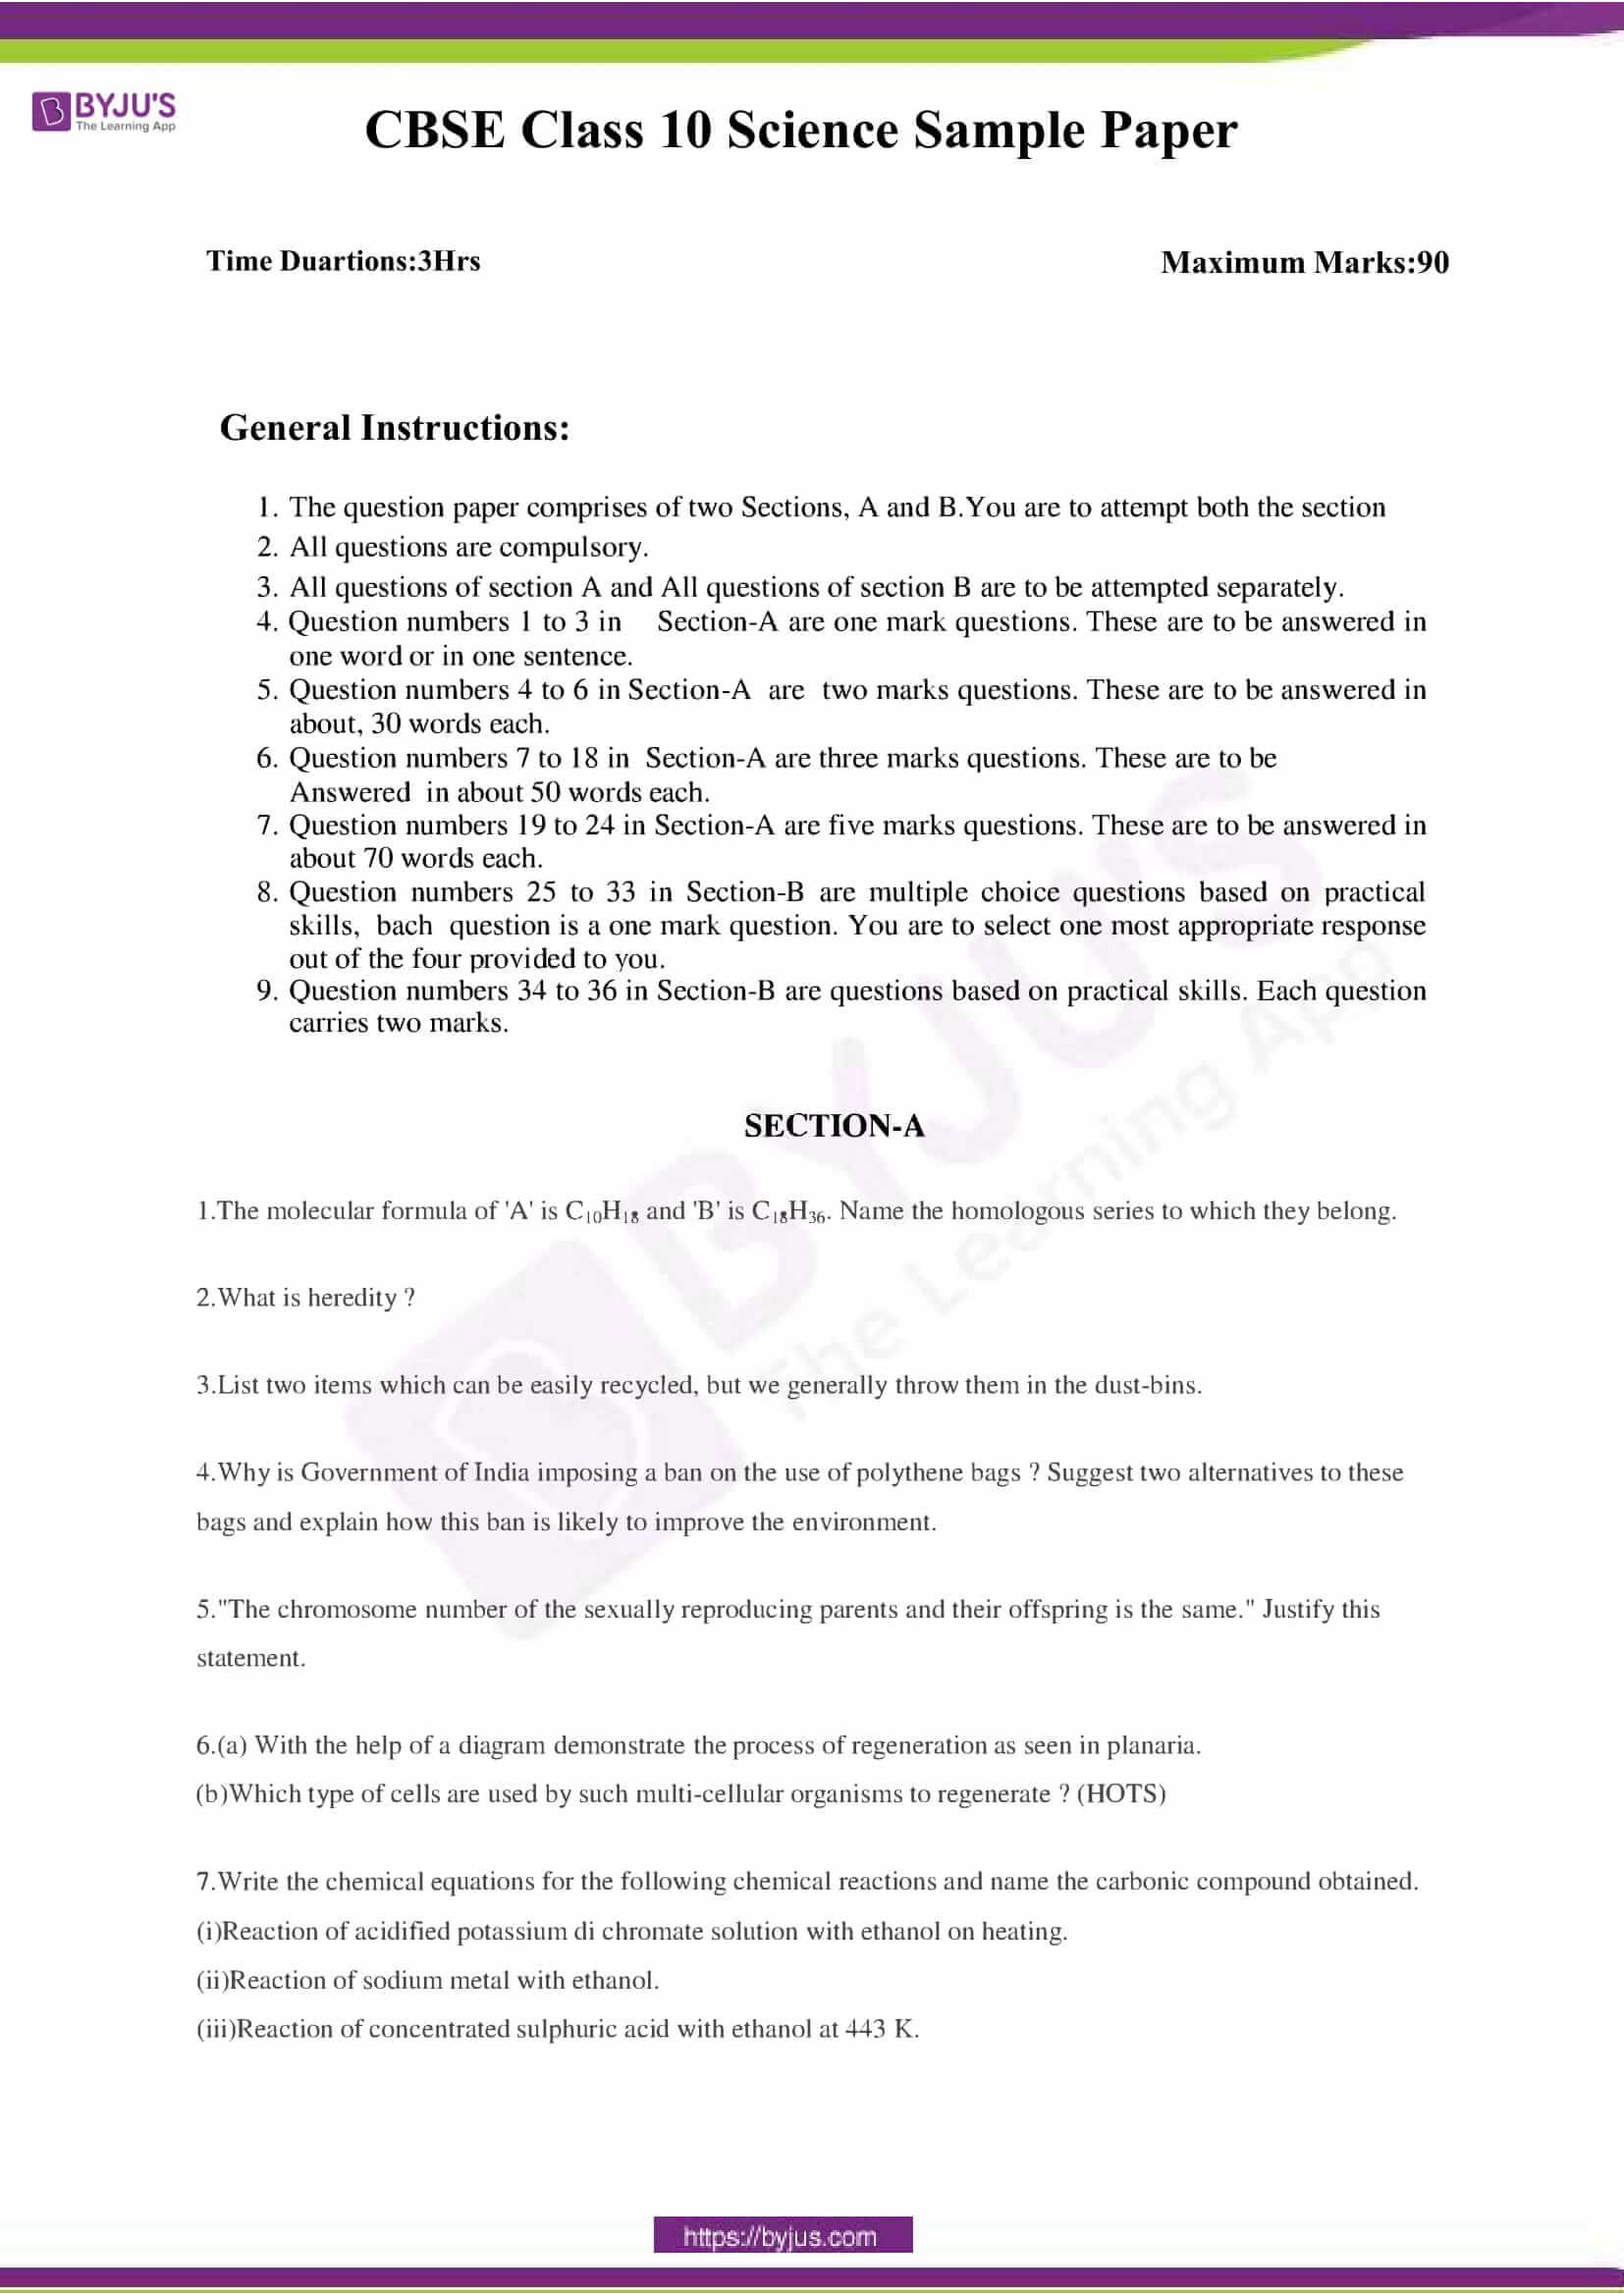 CBSE Class 10 Science Sample Paper Set 3-1